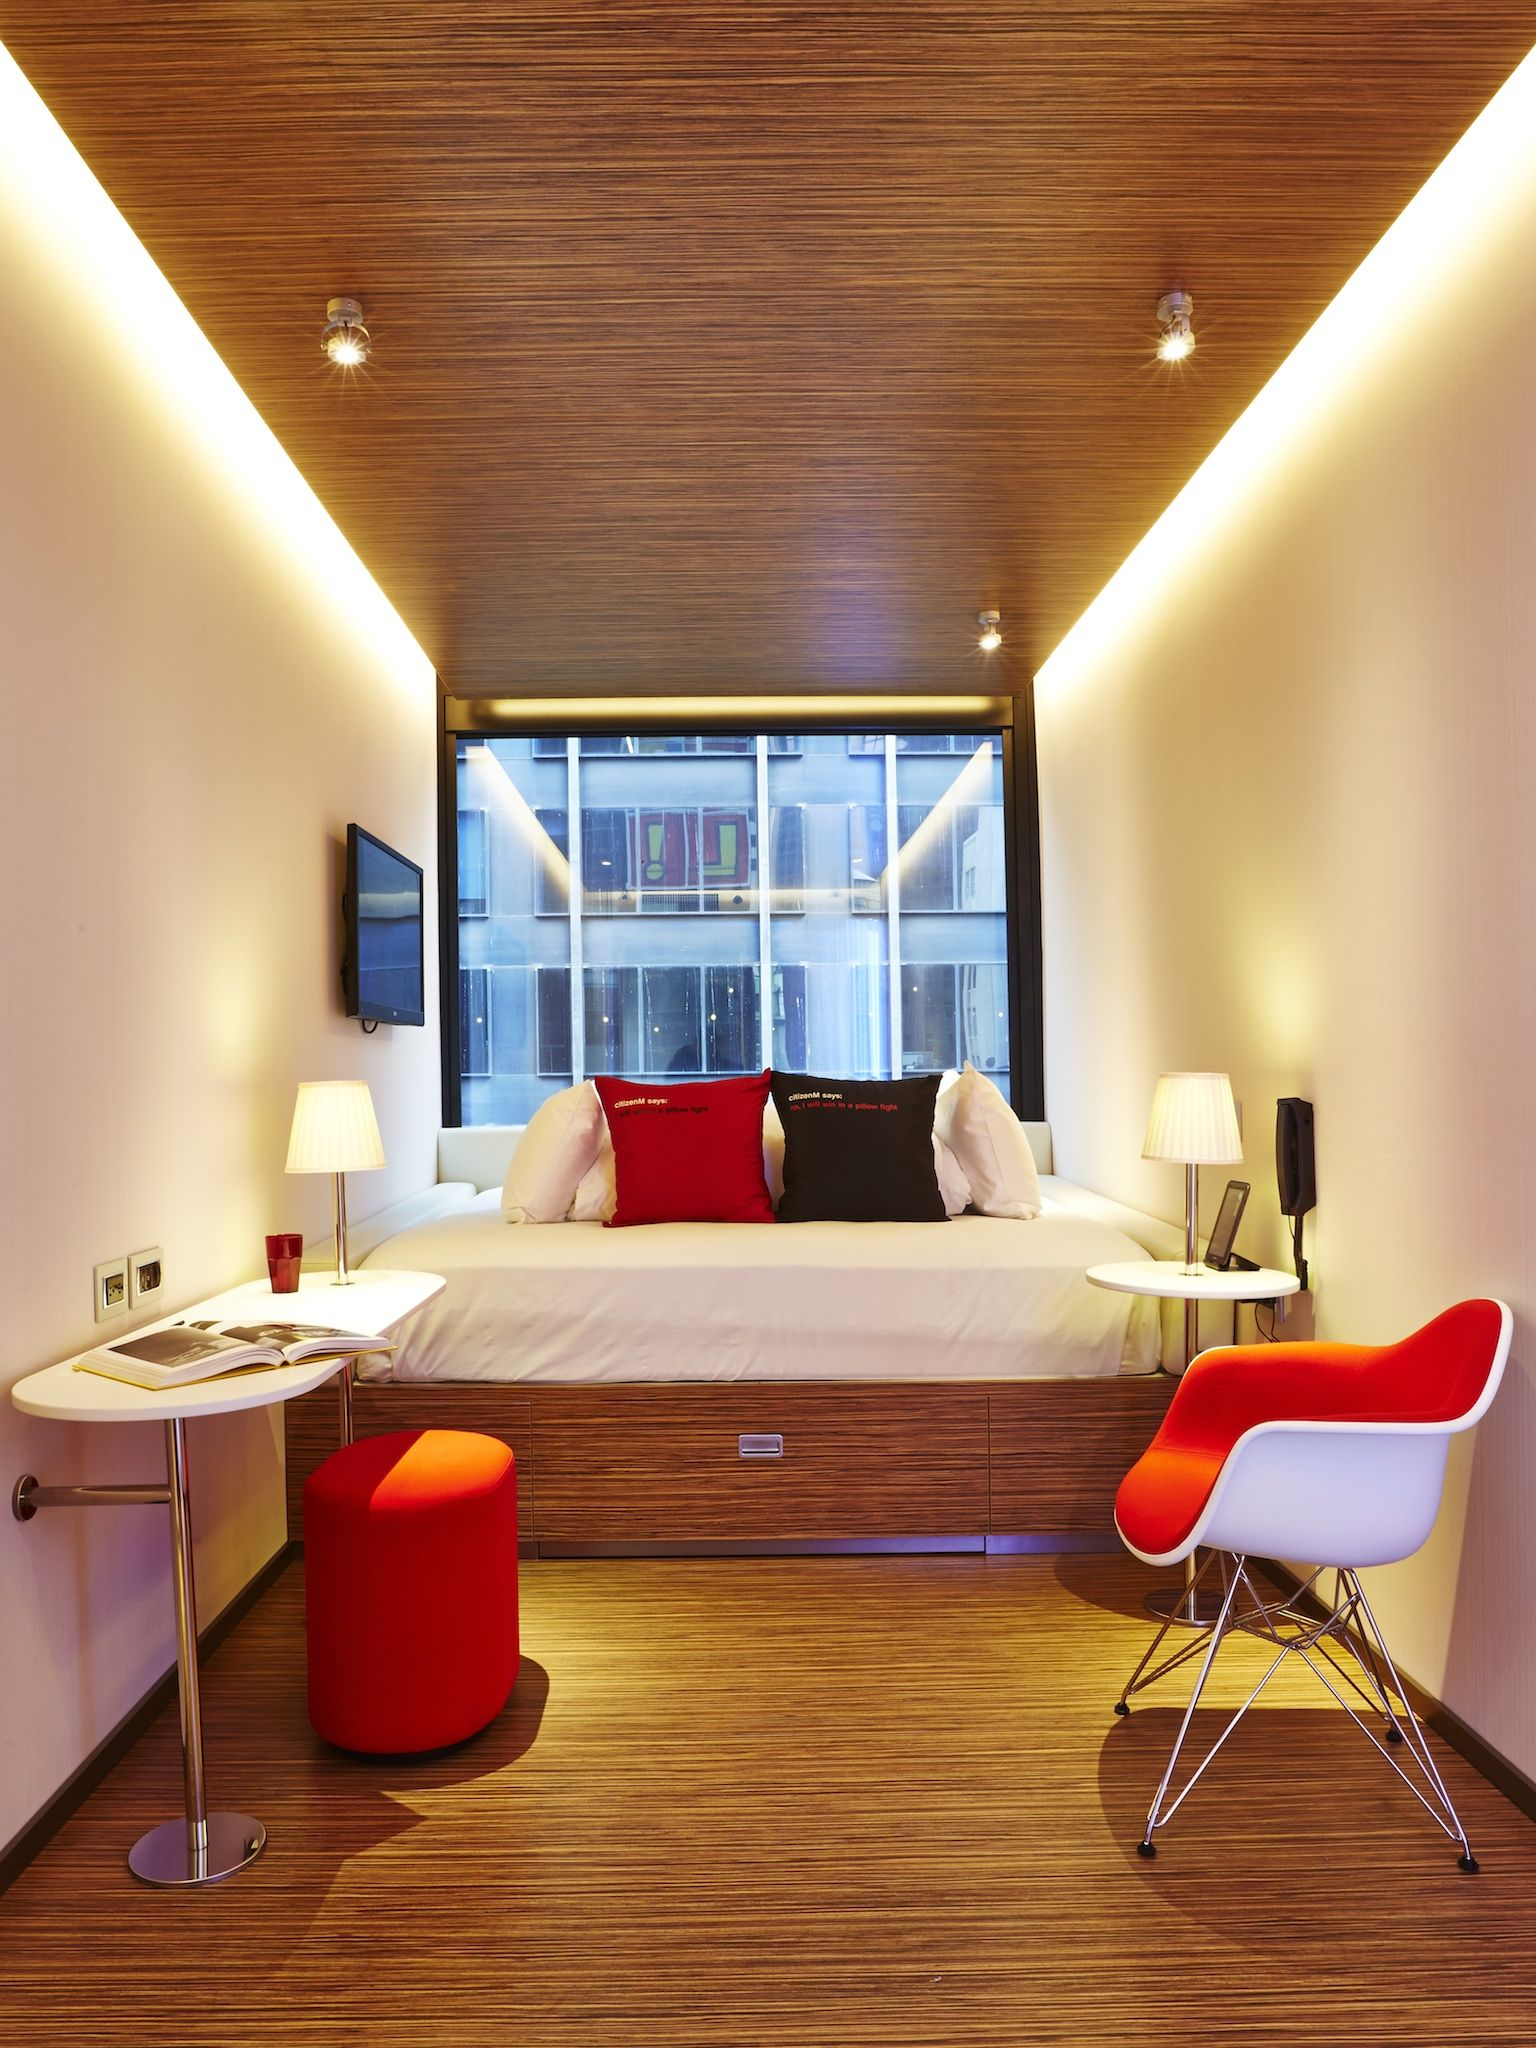 pin compact city room - photo #1